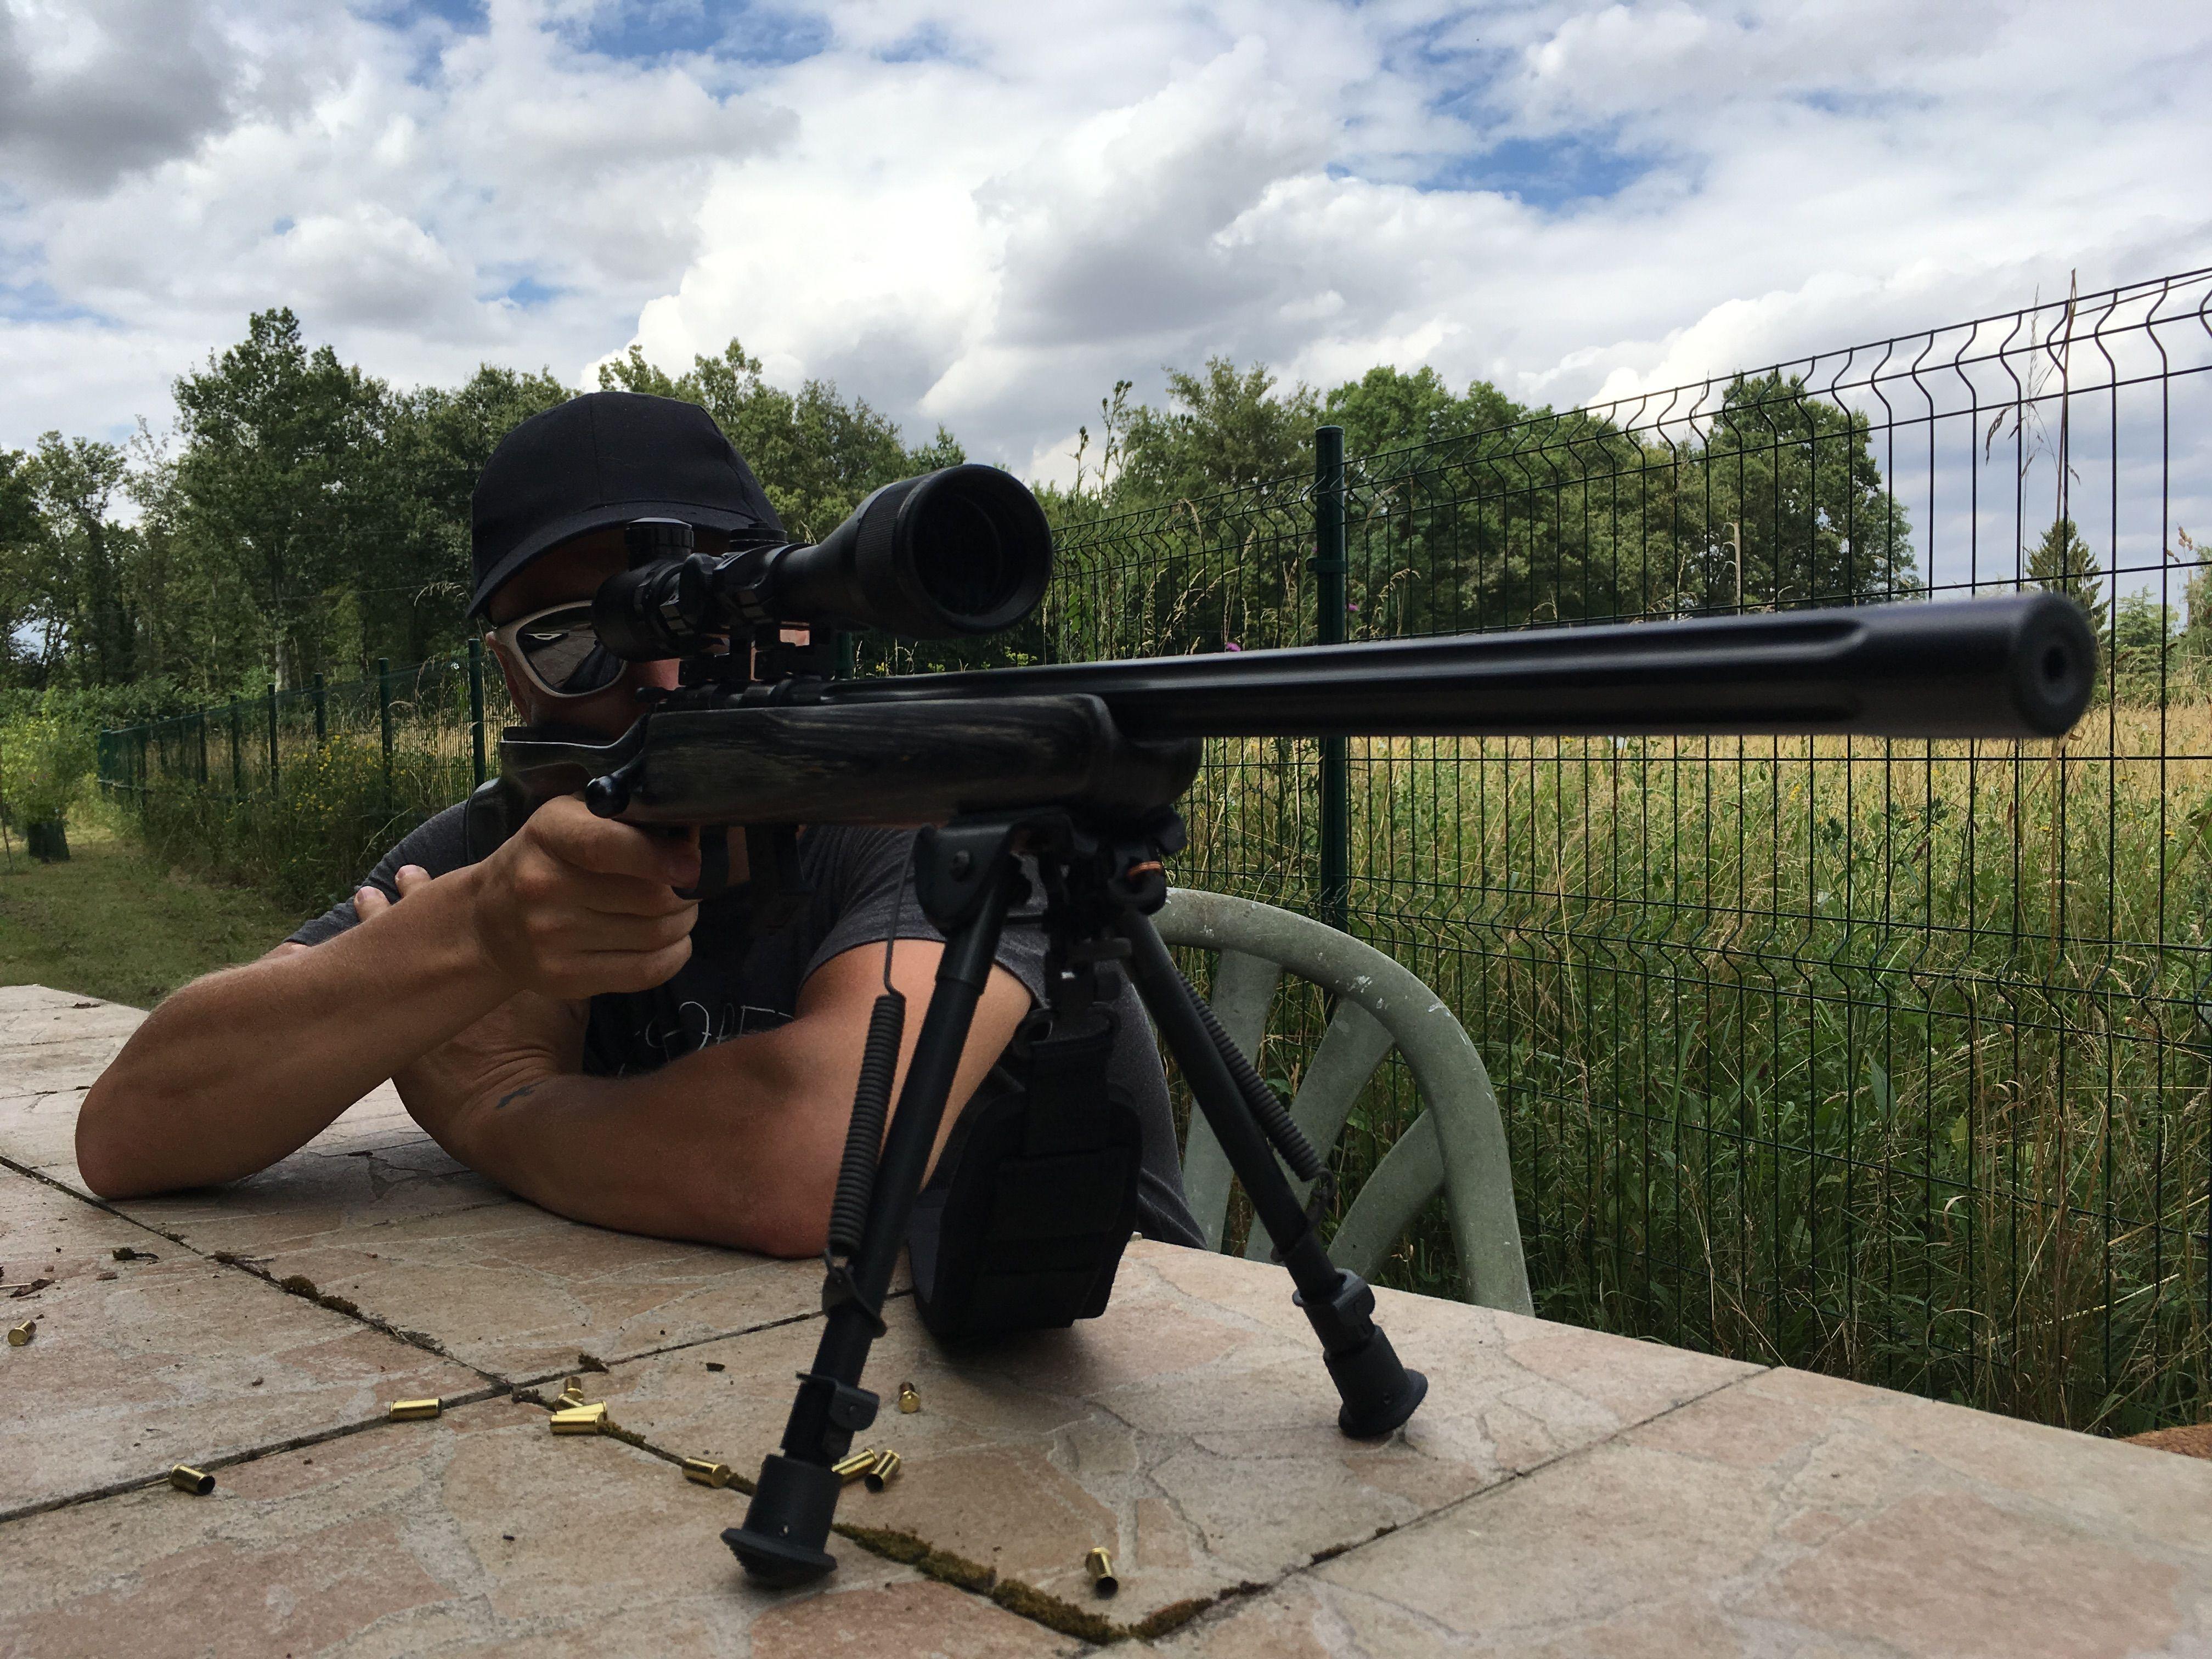 CZ 455 thumbhole | CZ 455 varmint evolution | Guns, Firearms